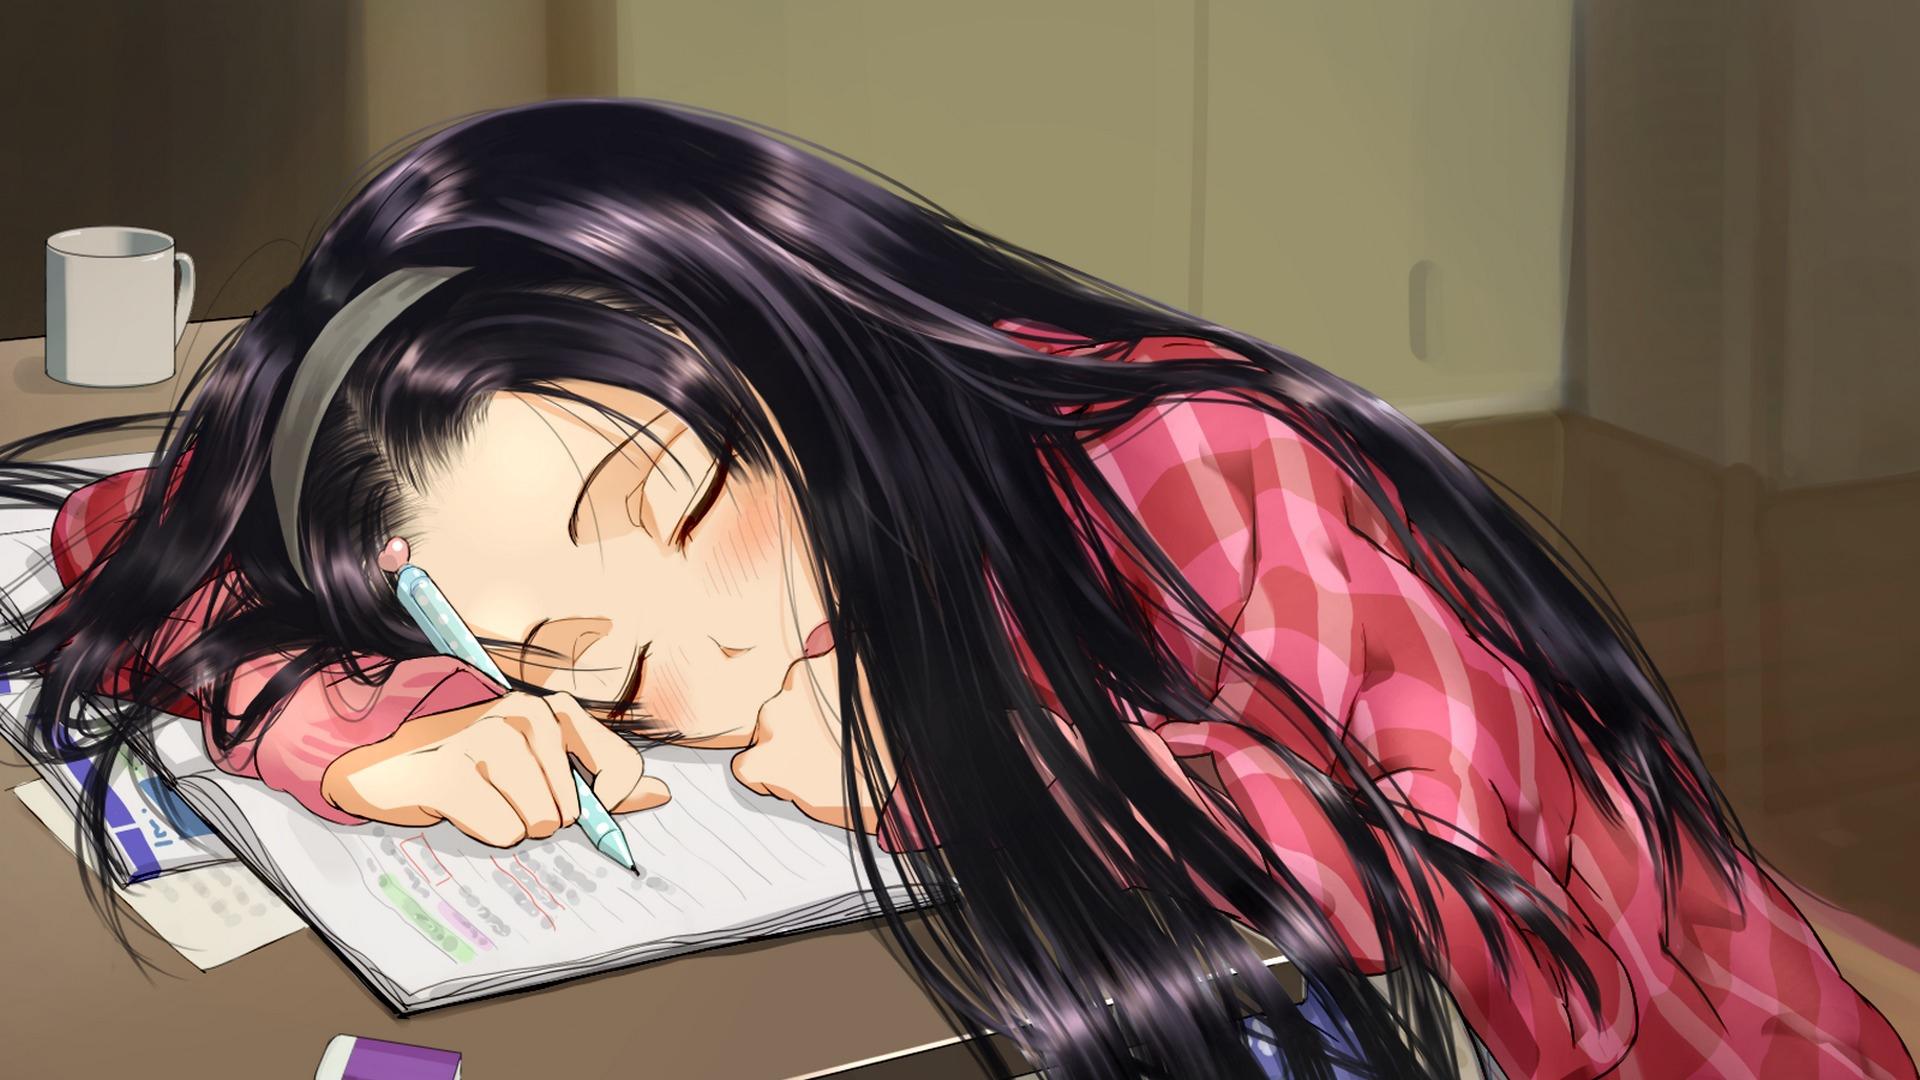 1920x1080-sakura-ani-dream-became-education-notebook-pen-wallpaper-wp360910